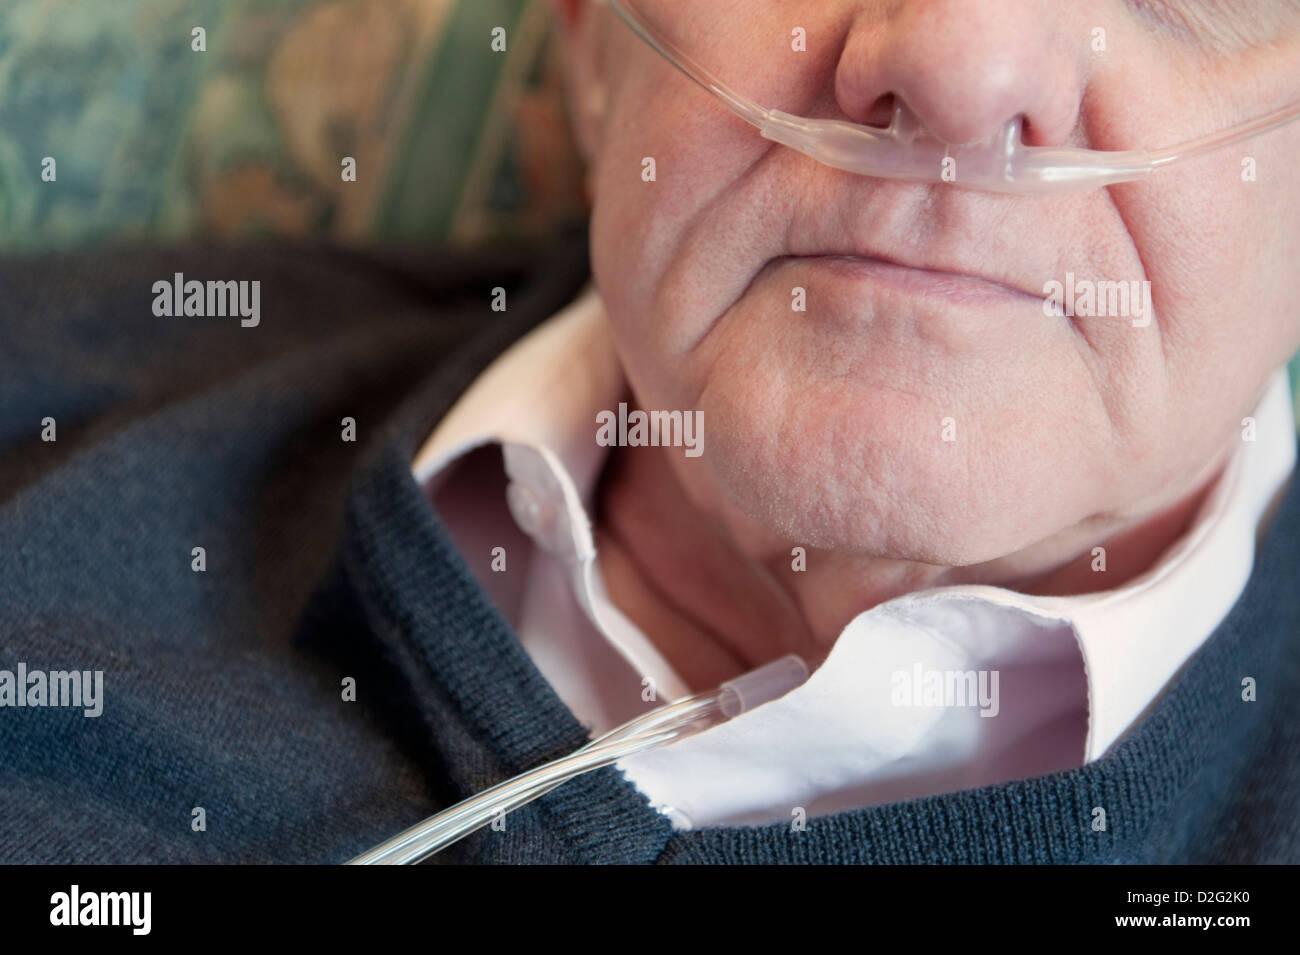 Portrait of an elderly man wearing oxygen nasal tube - Stock Image